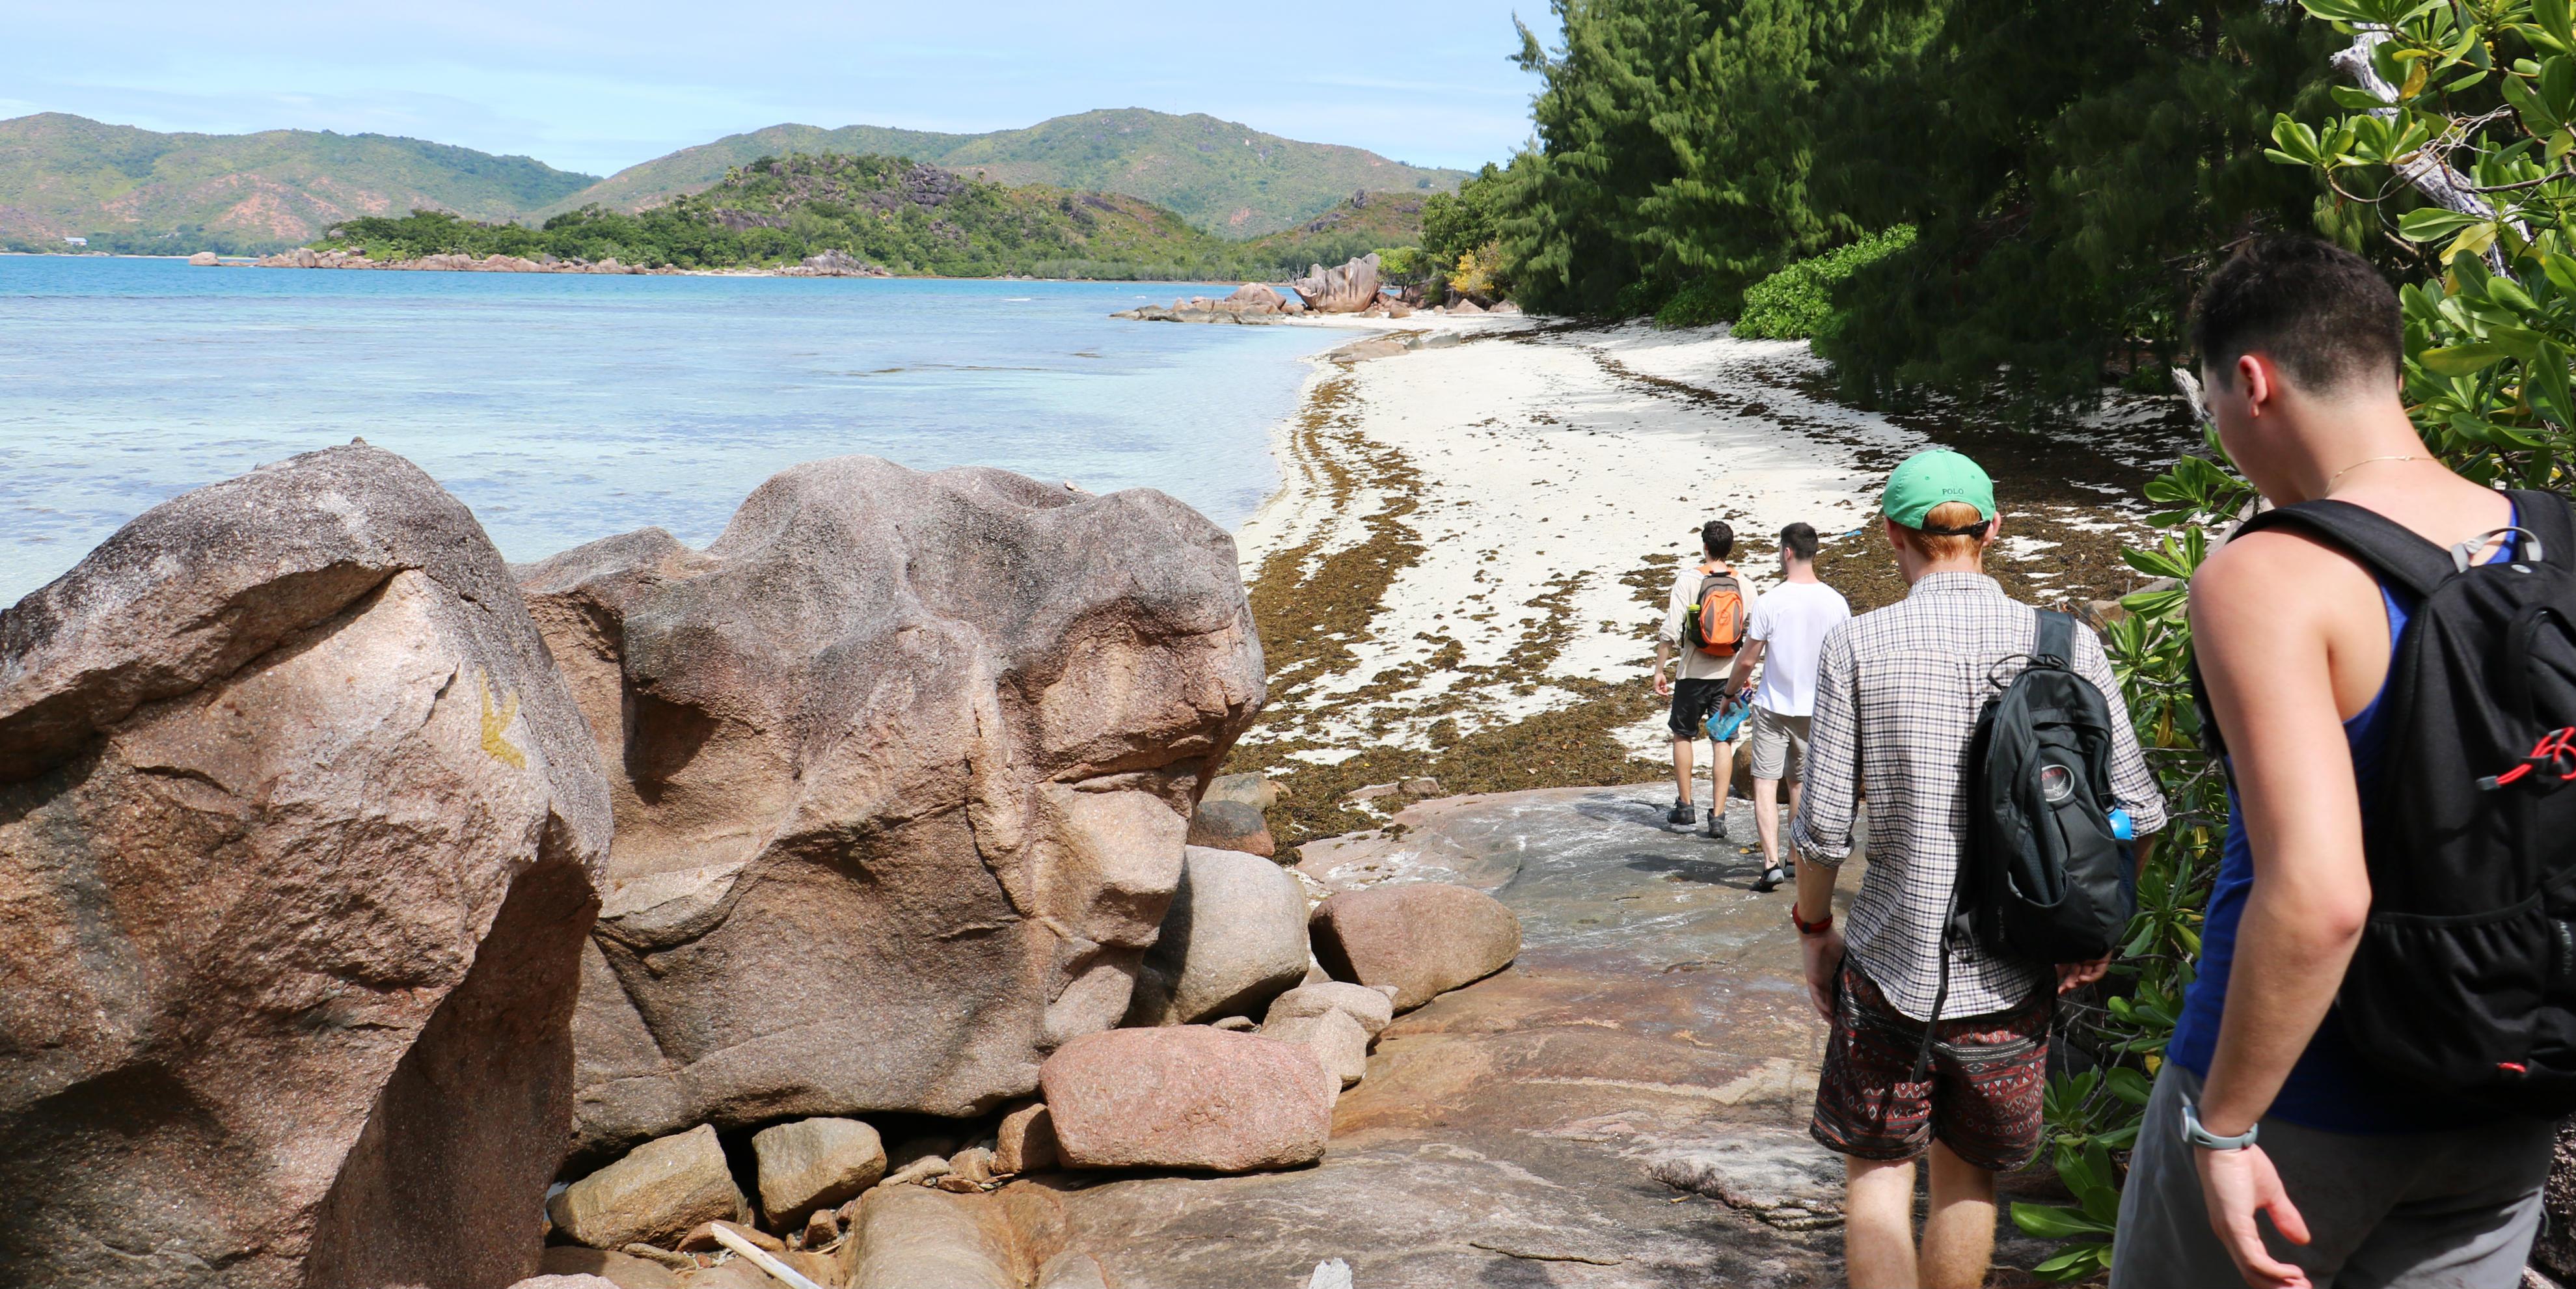 GVI participants enjoy a walk on an island in the Seychelles archipelago.